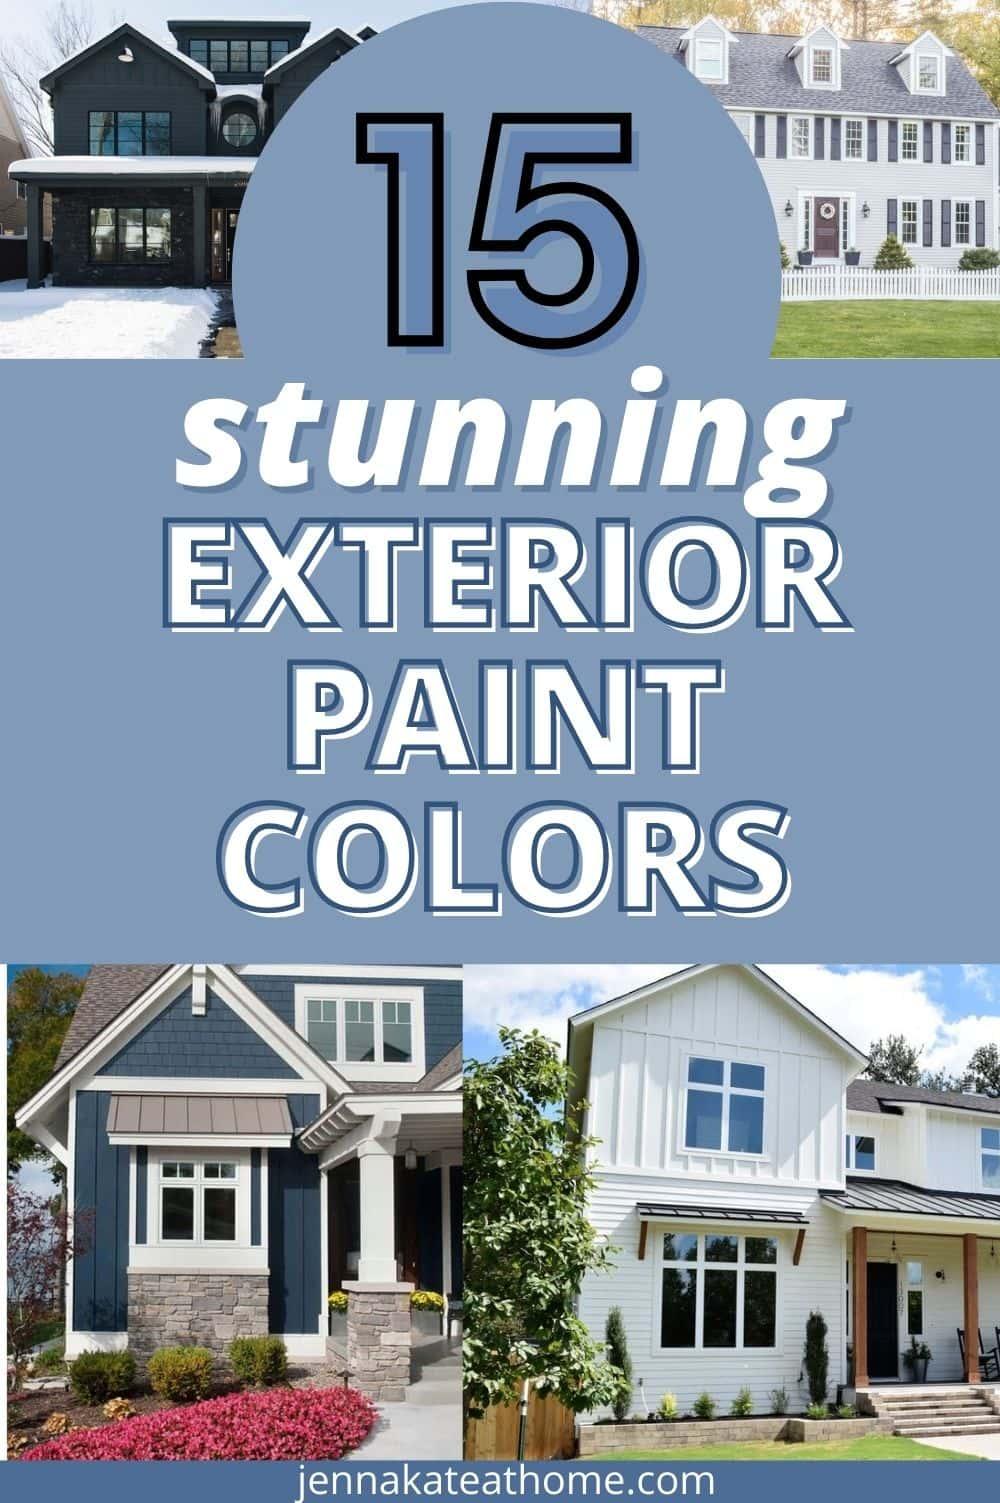 15 stunning exterior paint colors pin